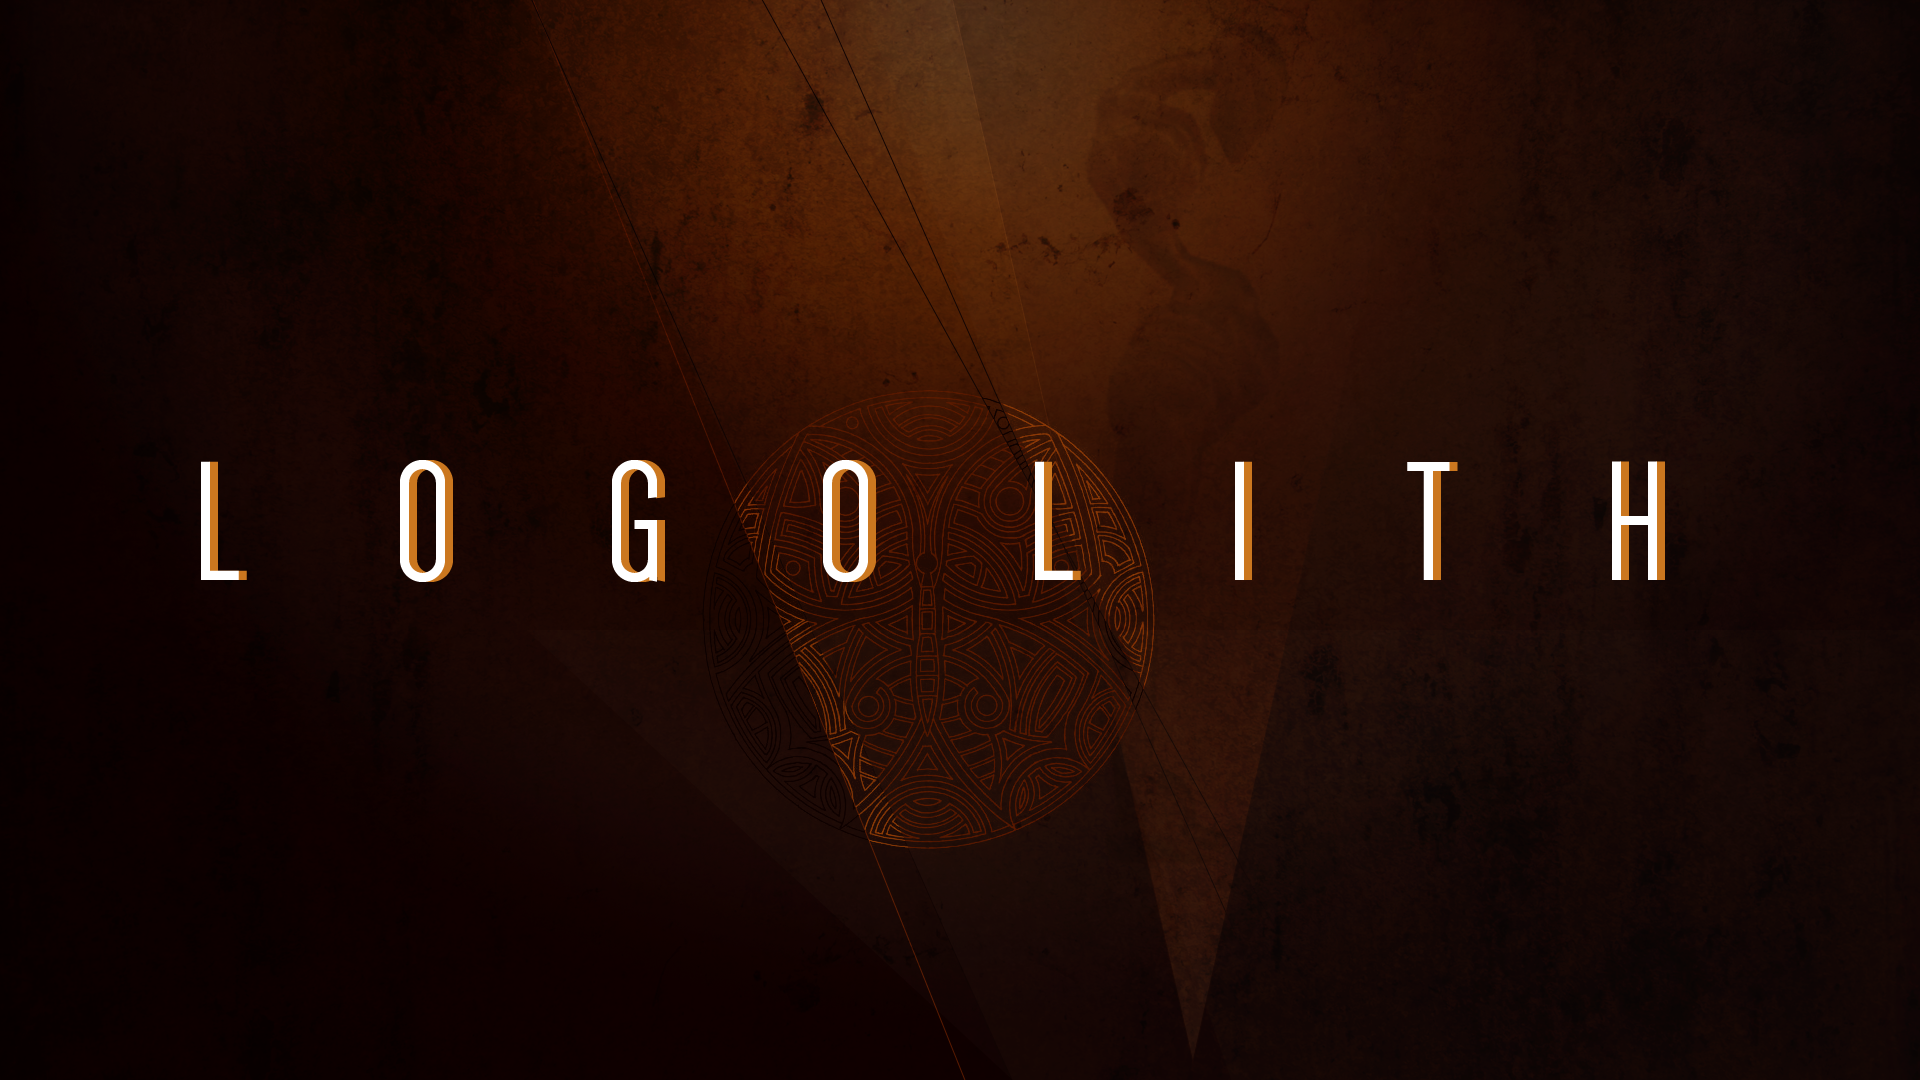 Logolith